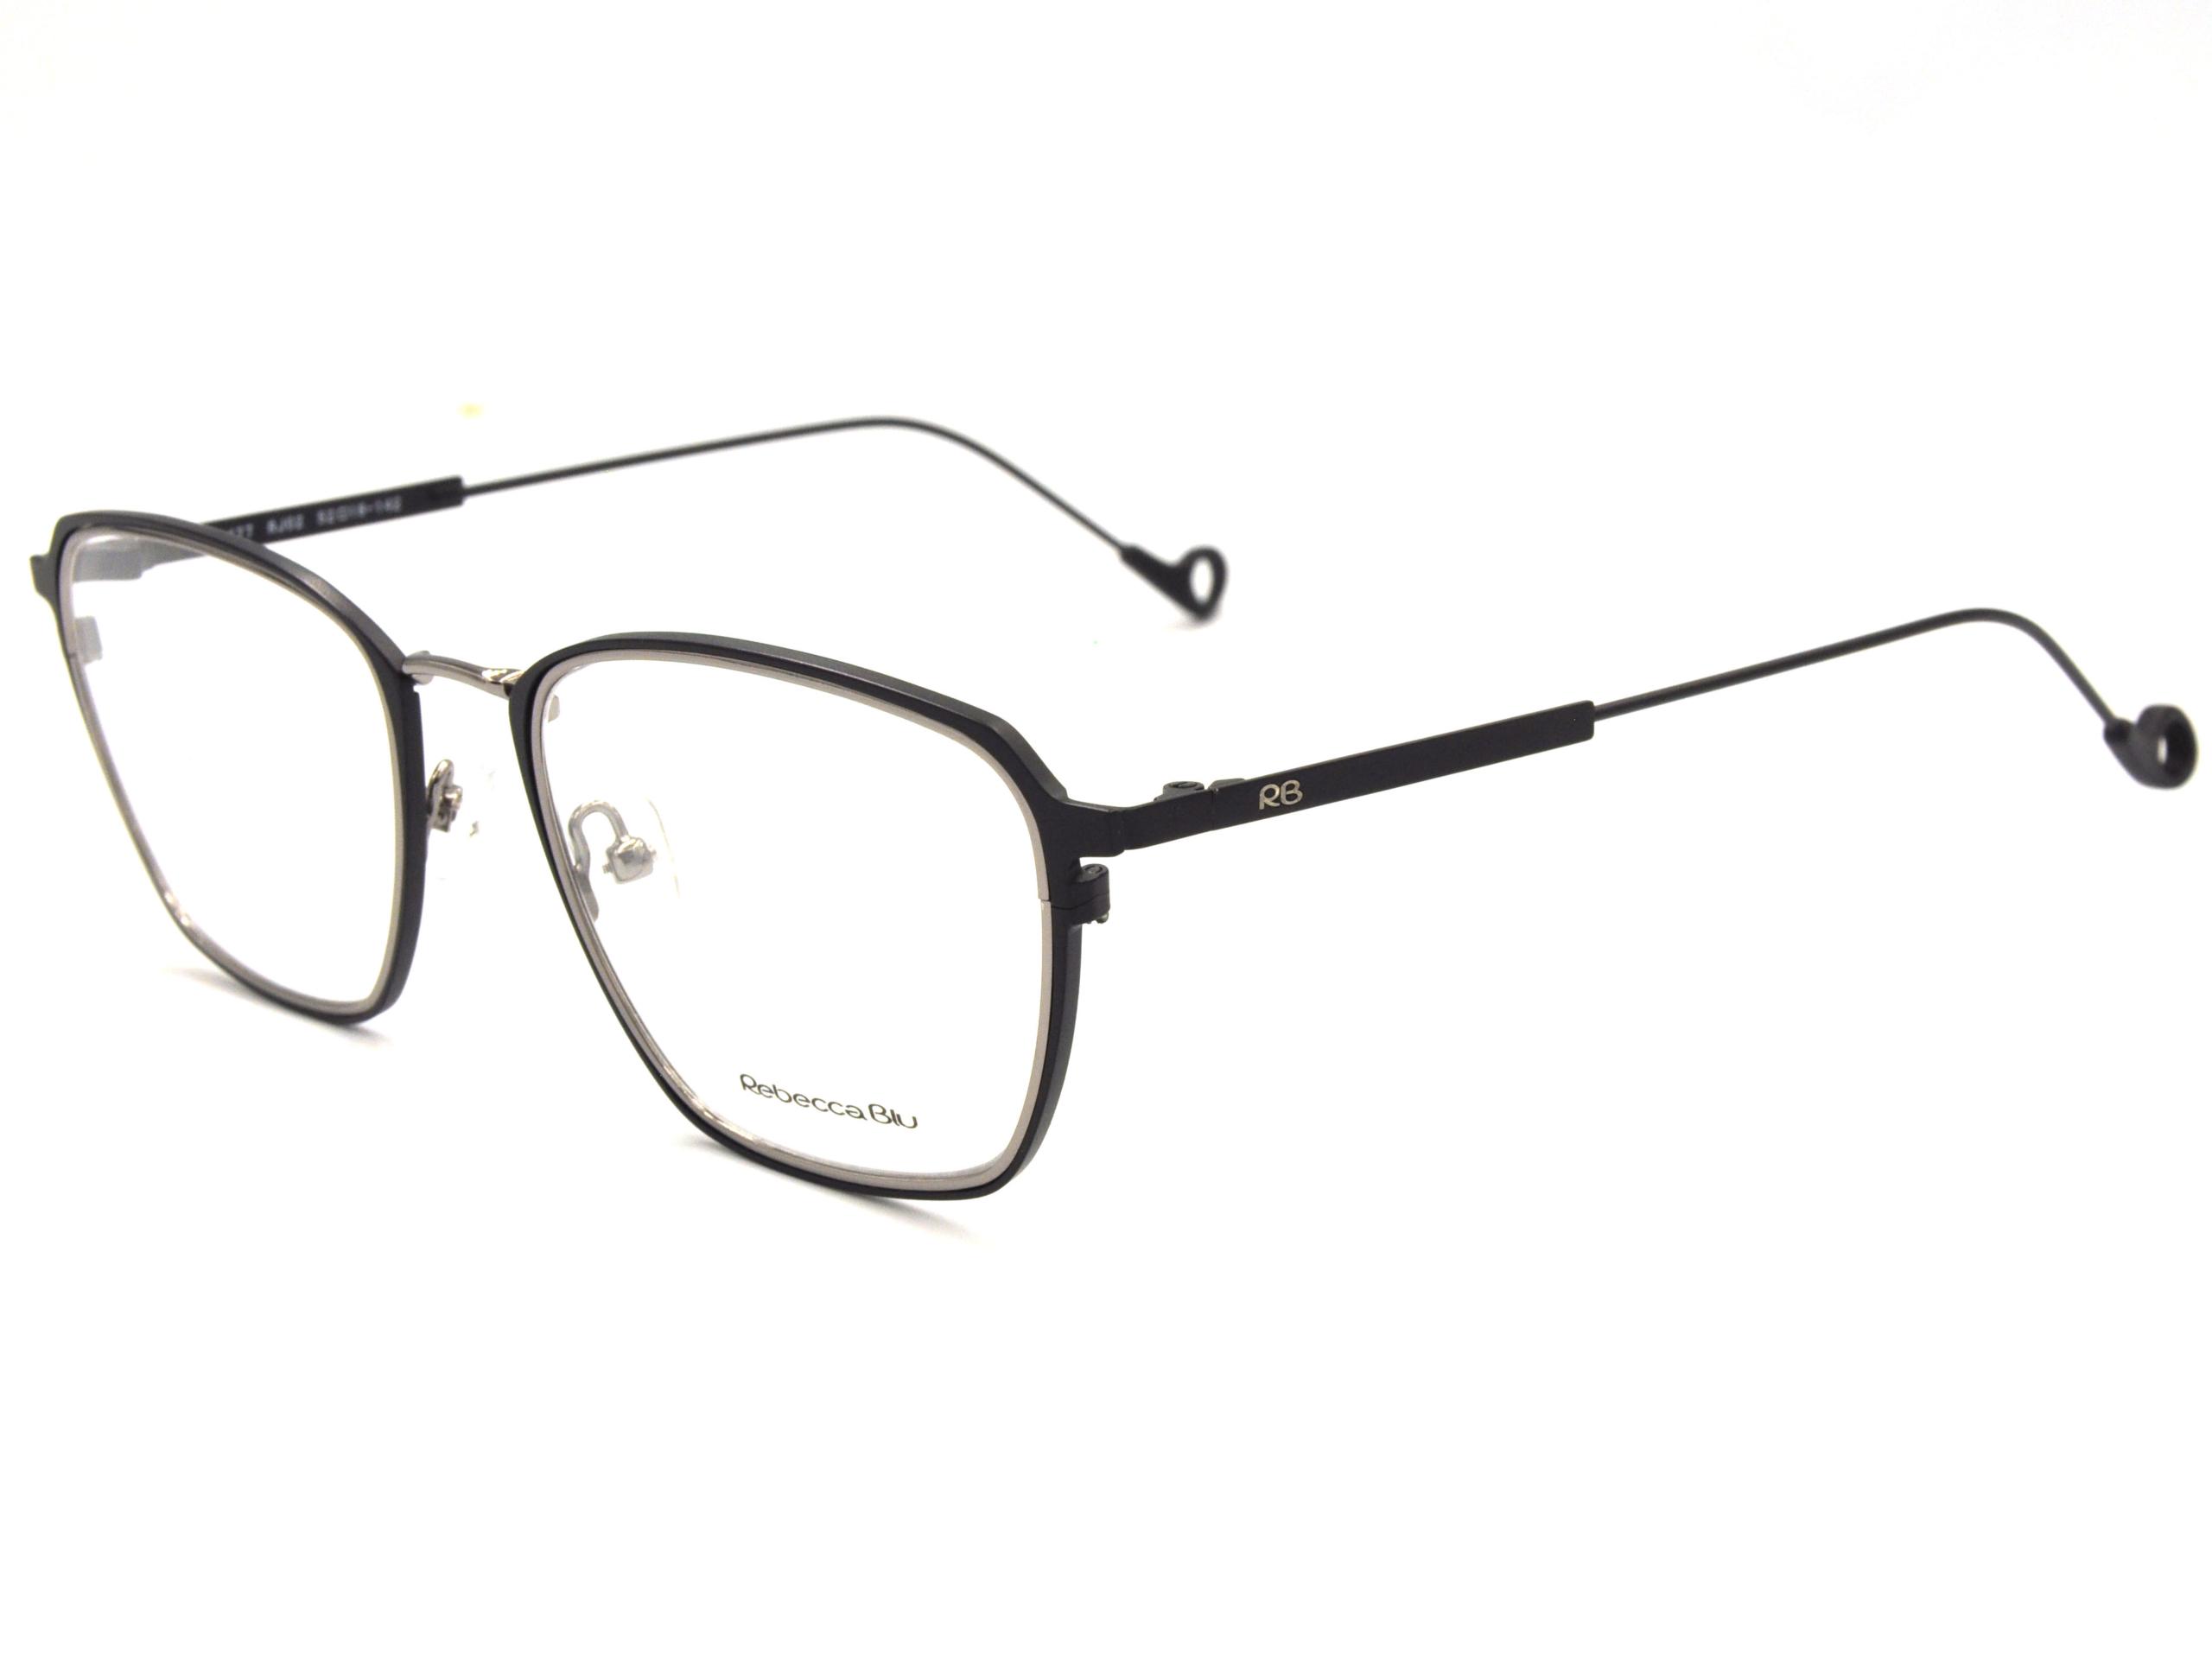 Rebecca Blu RB7477 RJ02 Prescription Glasses 2020